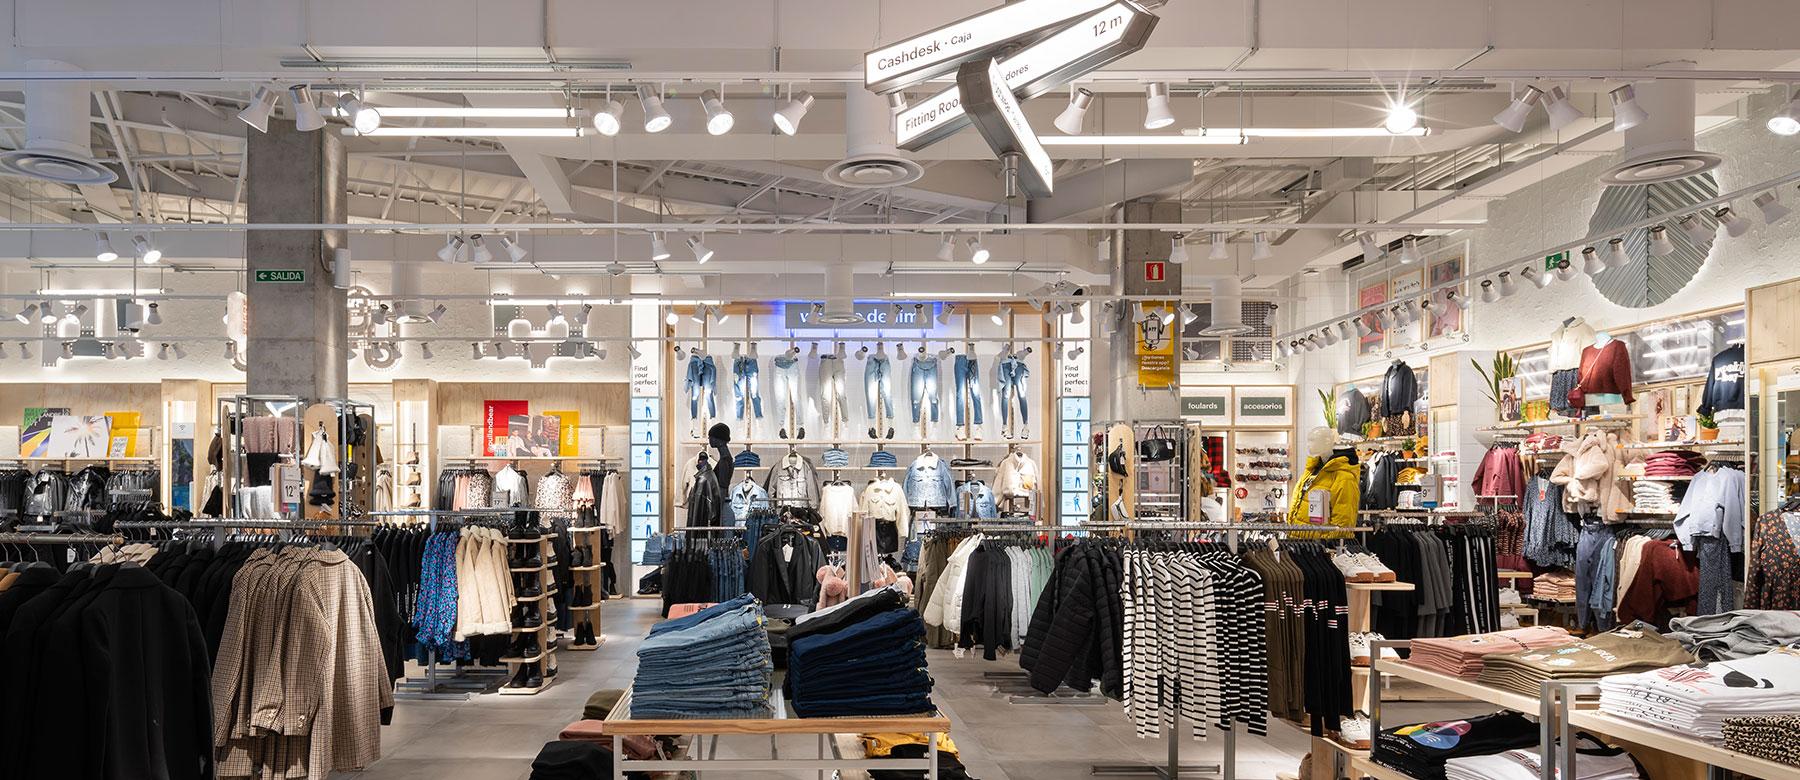 Iluminación retail Pull and Bear Islazul 03